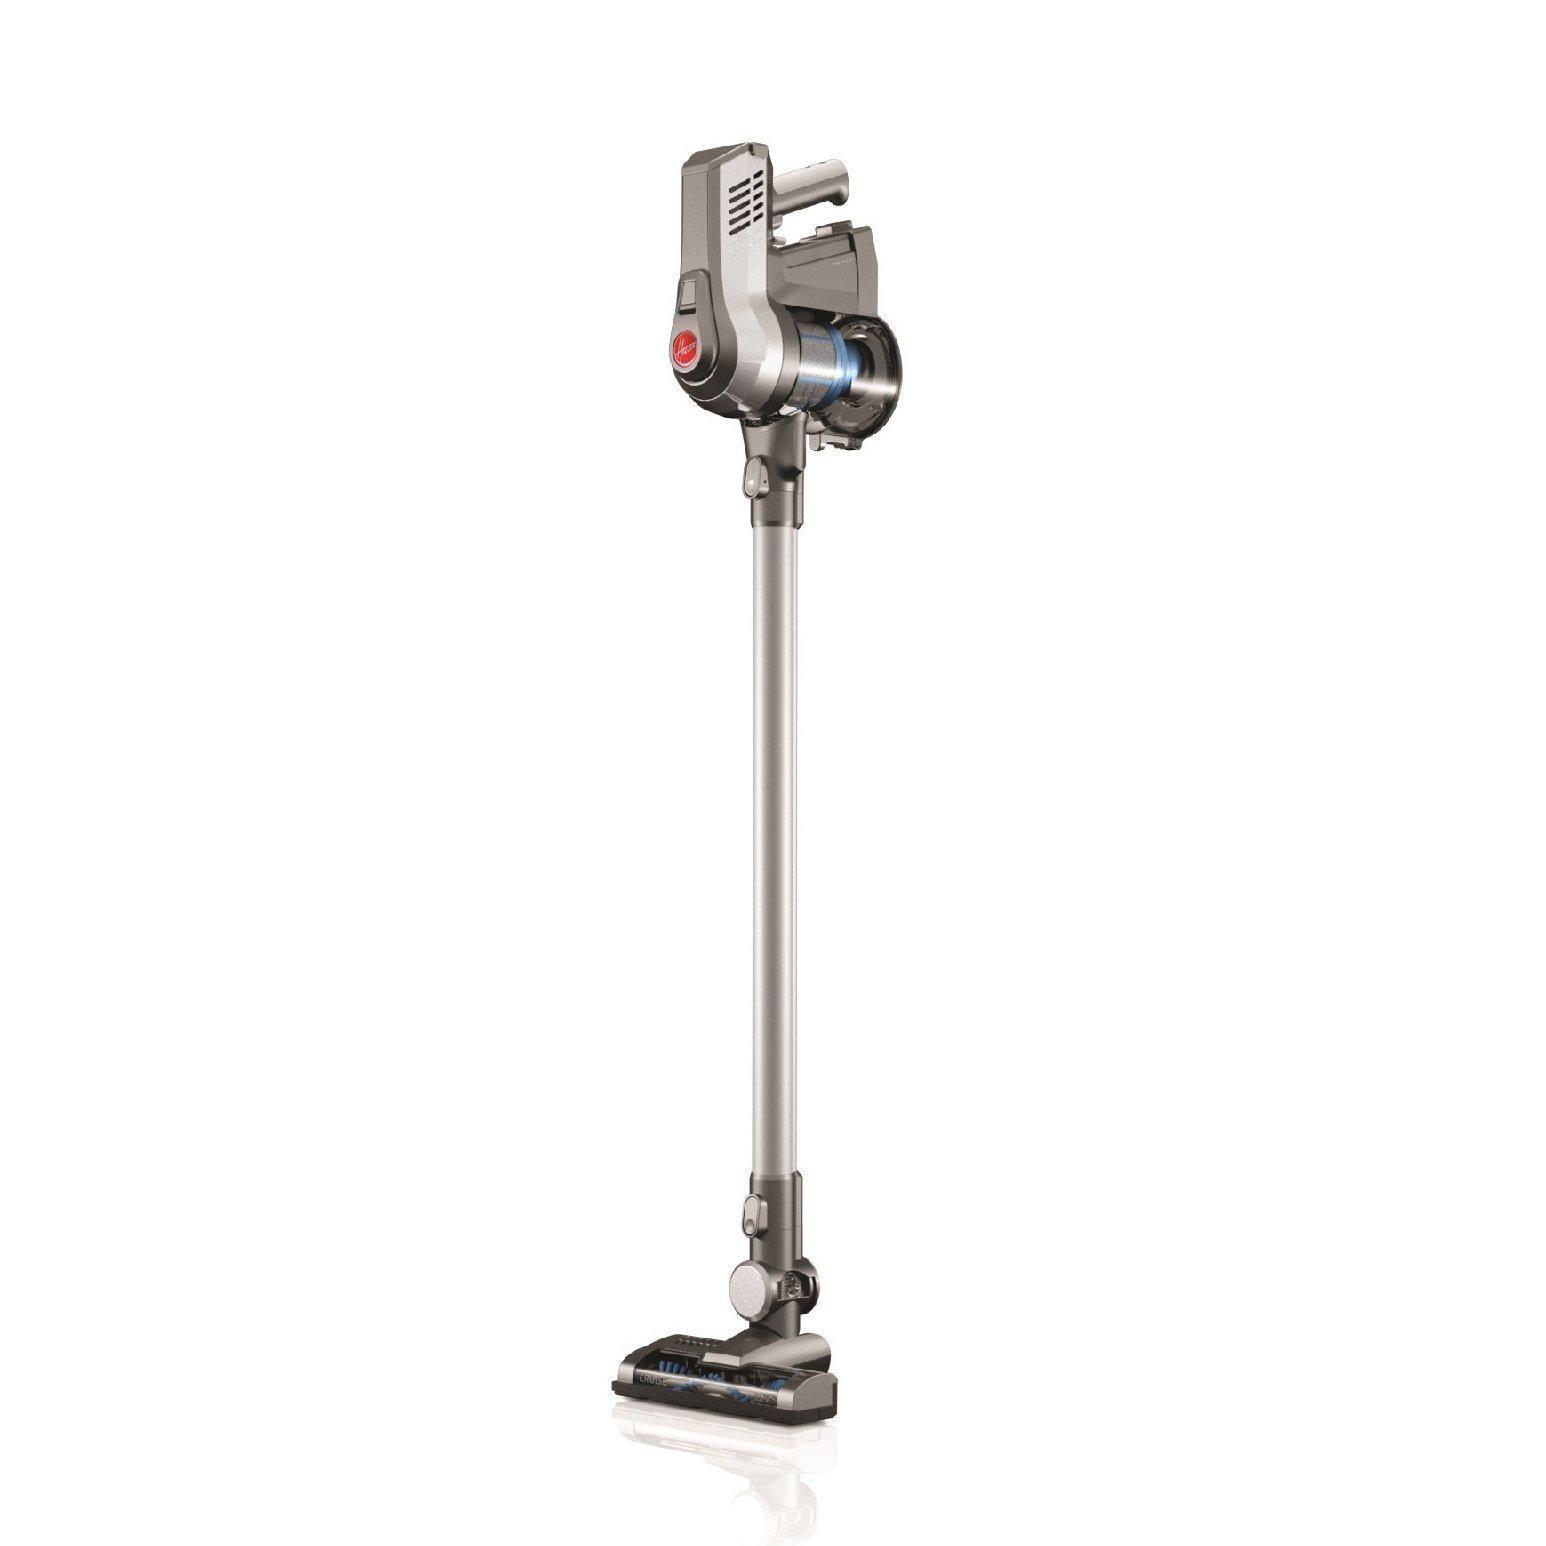 BH52210 Hoover Cruise Ultra Light Cordless Stick Vacuum